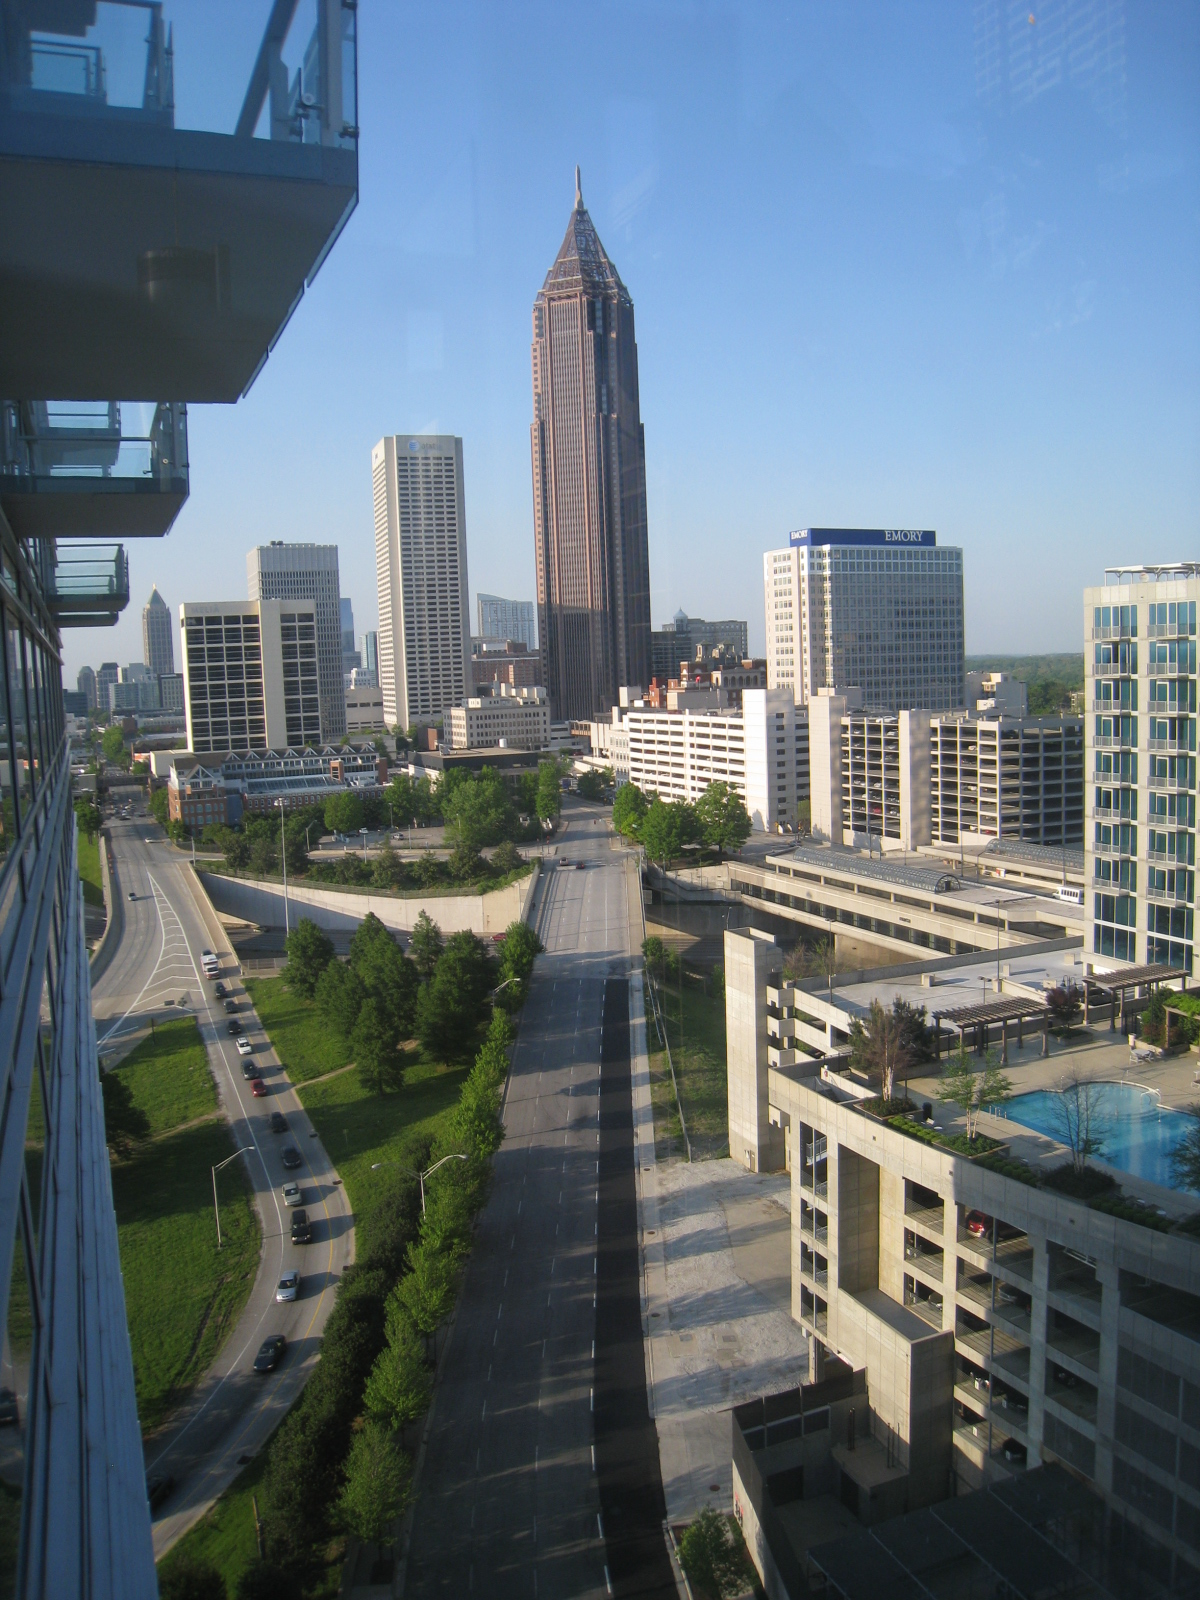 Honeywell Home Amp Business Technologies Hq To Midtown Atlanta